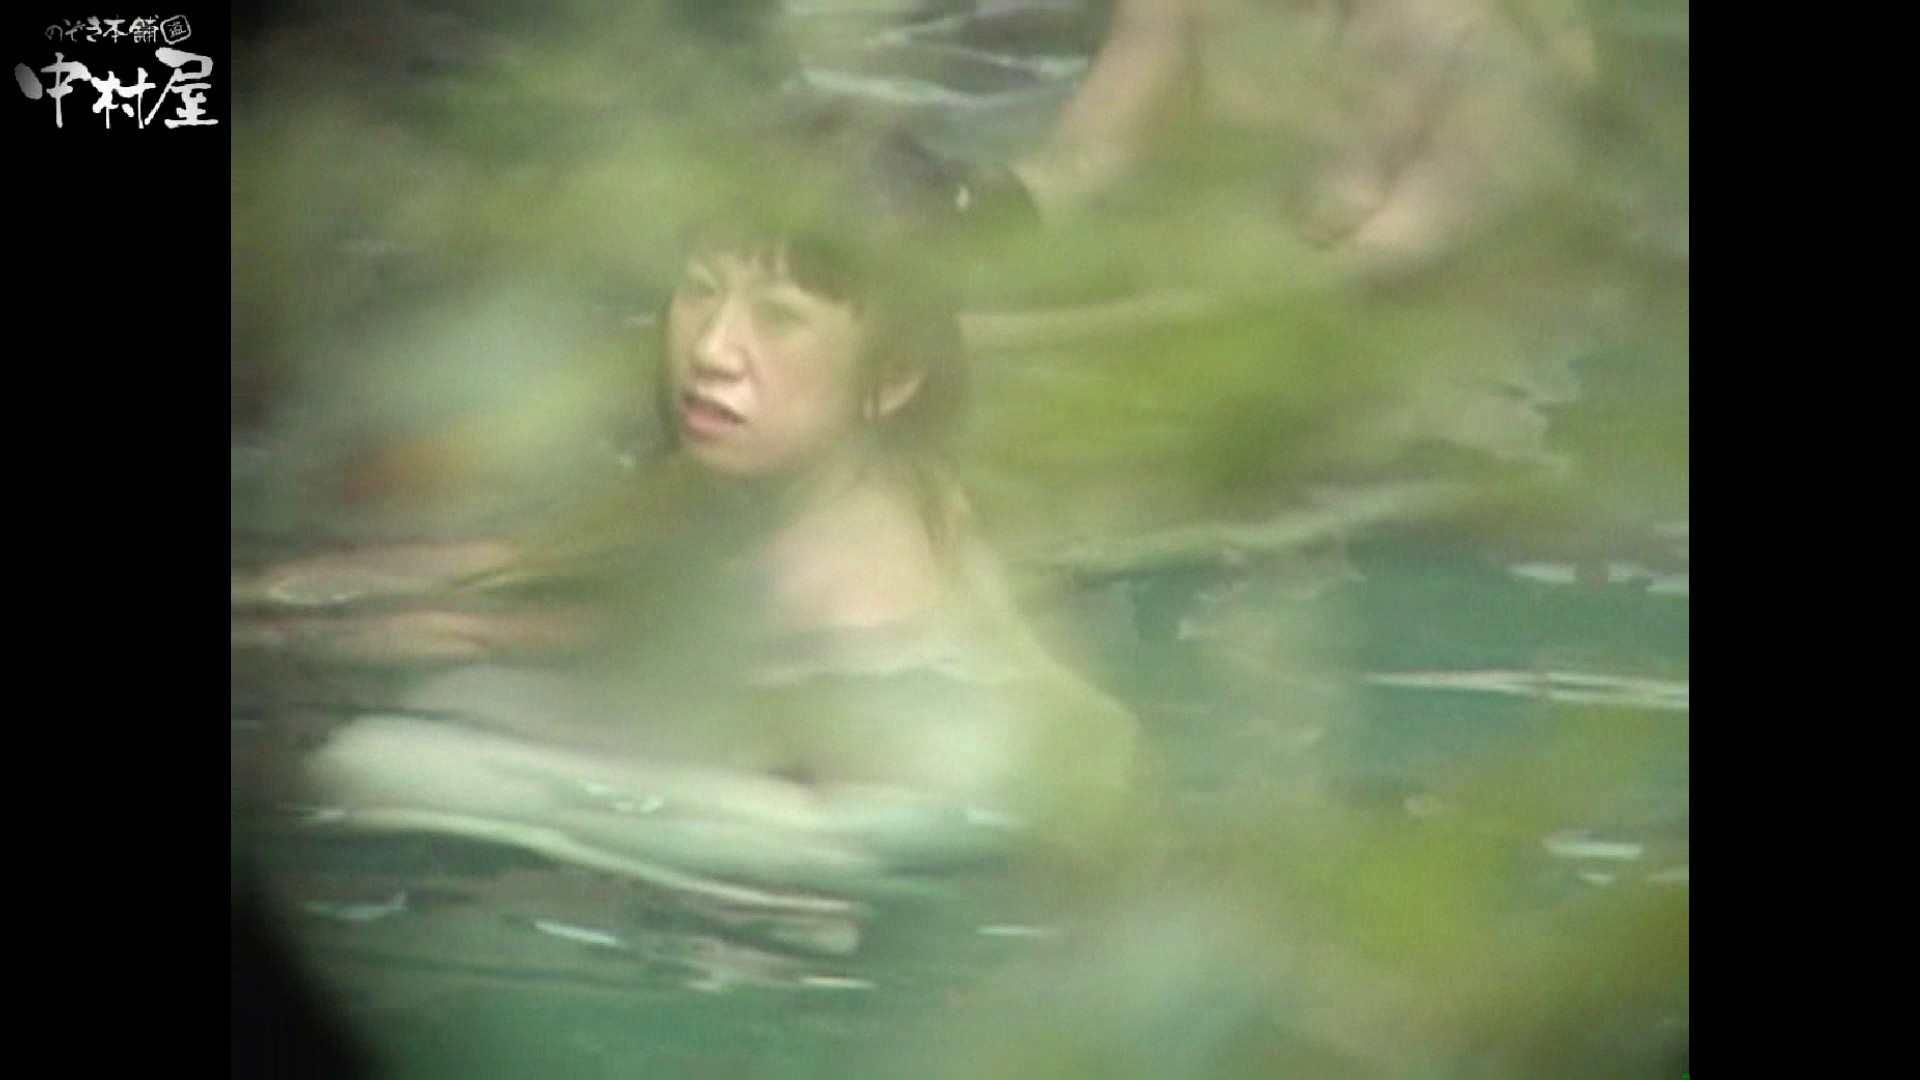 Aquaな露天風呂Vol.953 露天風呂編  90PIX 24